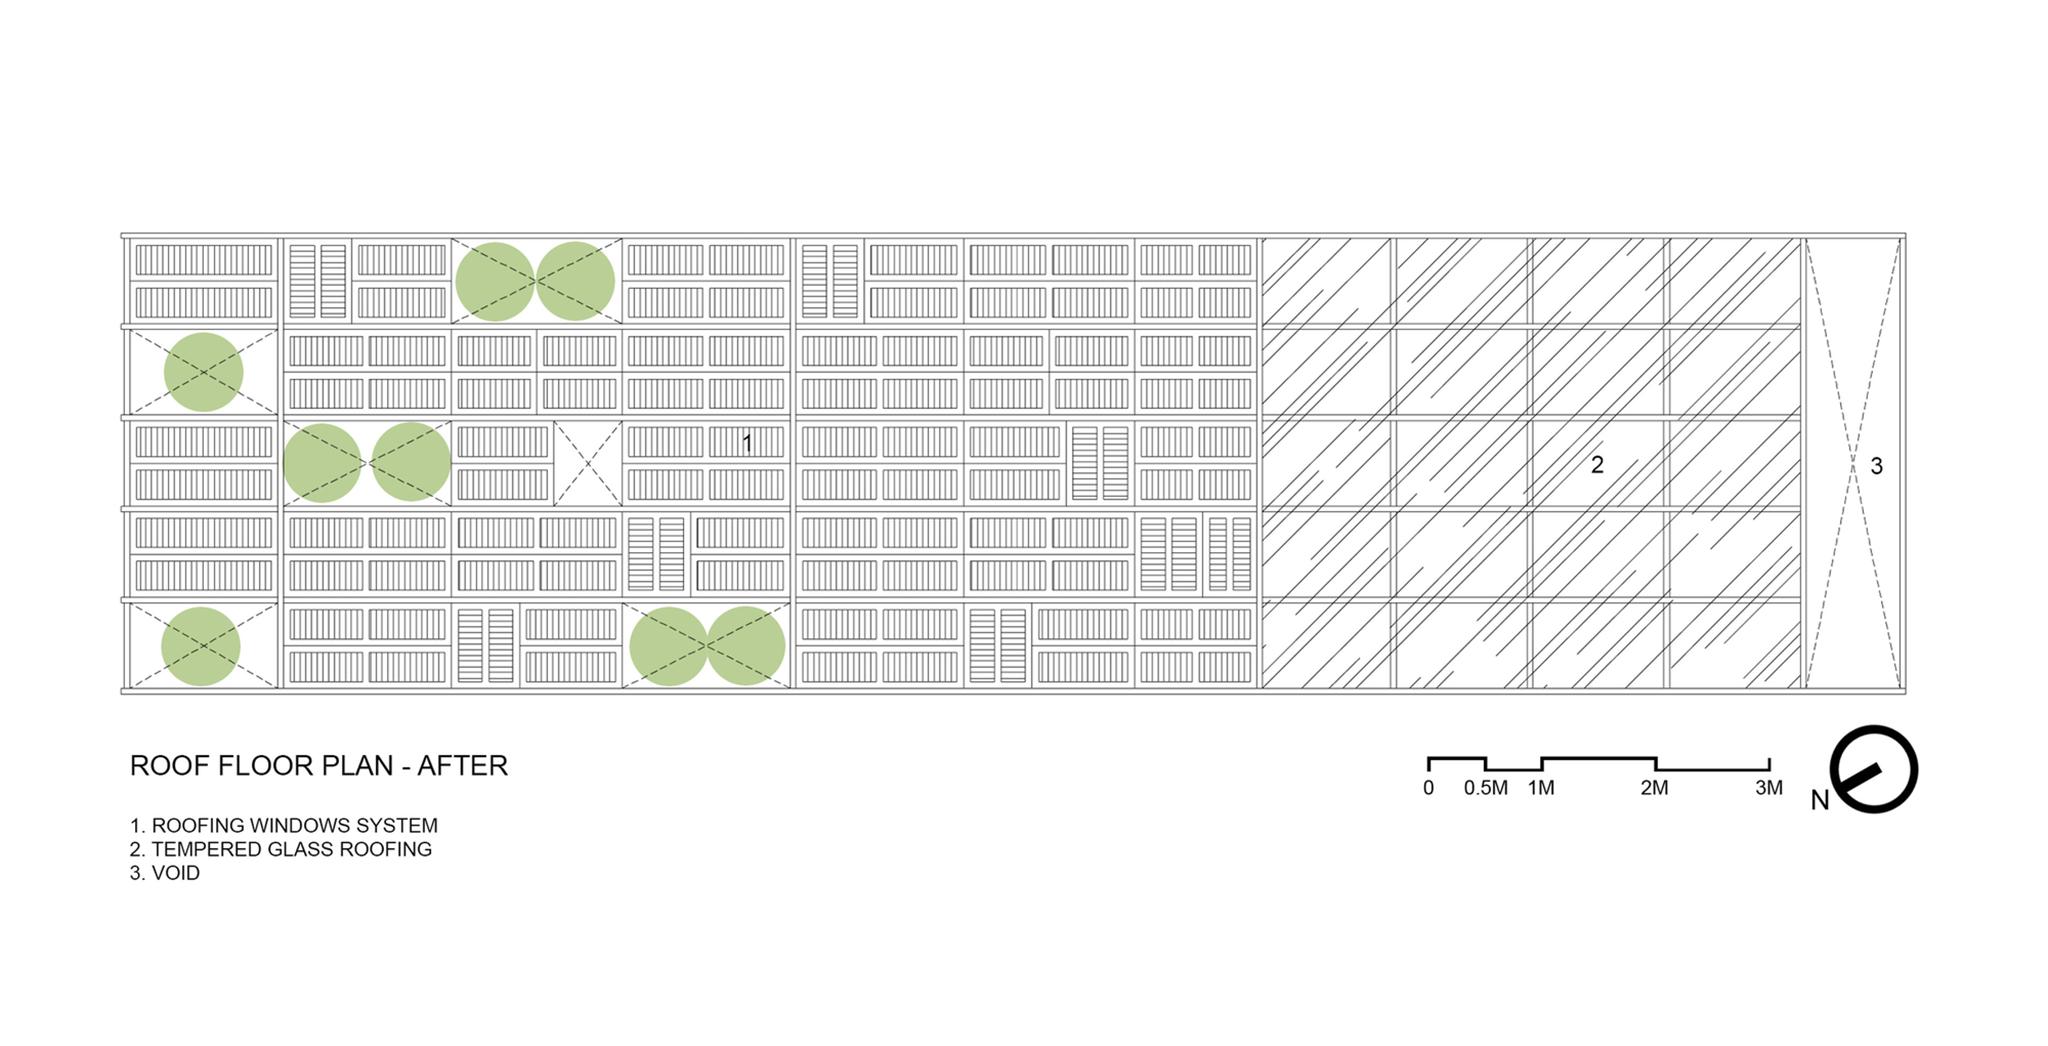 557a5be8e58eced6280001ff_vegan-house-block-architects_25 (Copy)